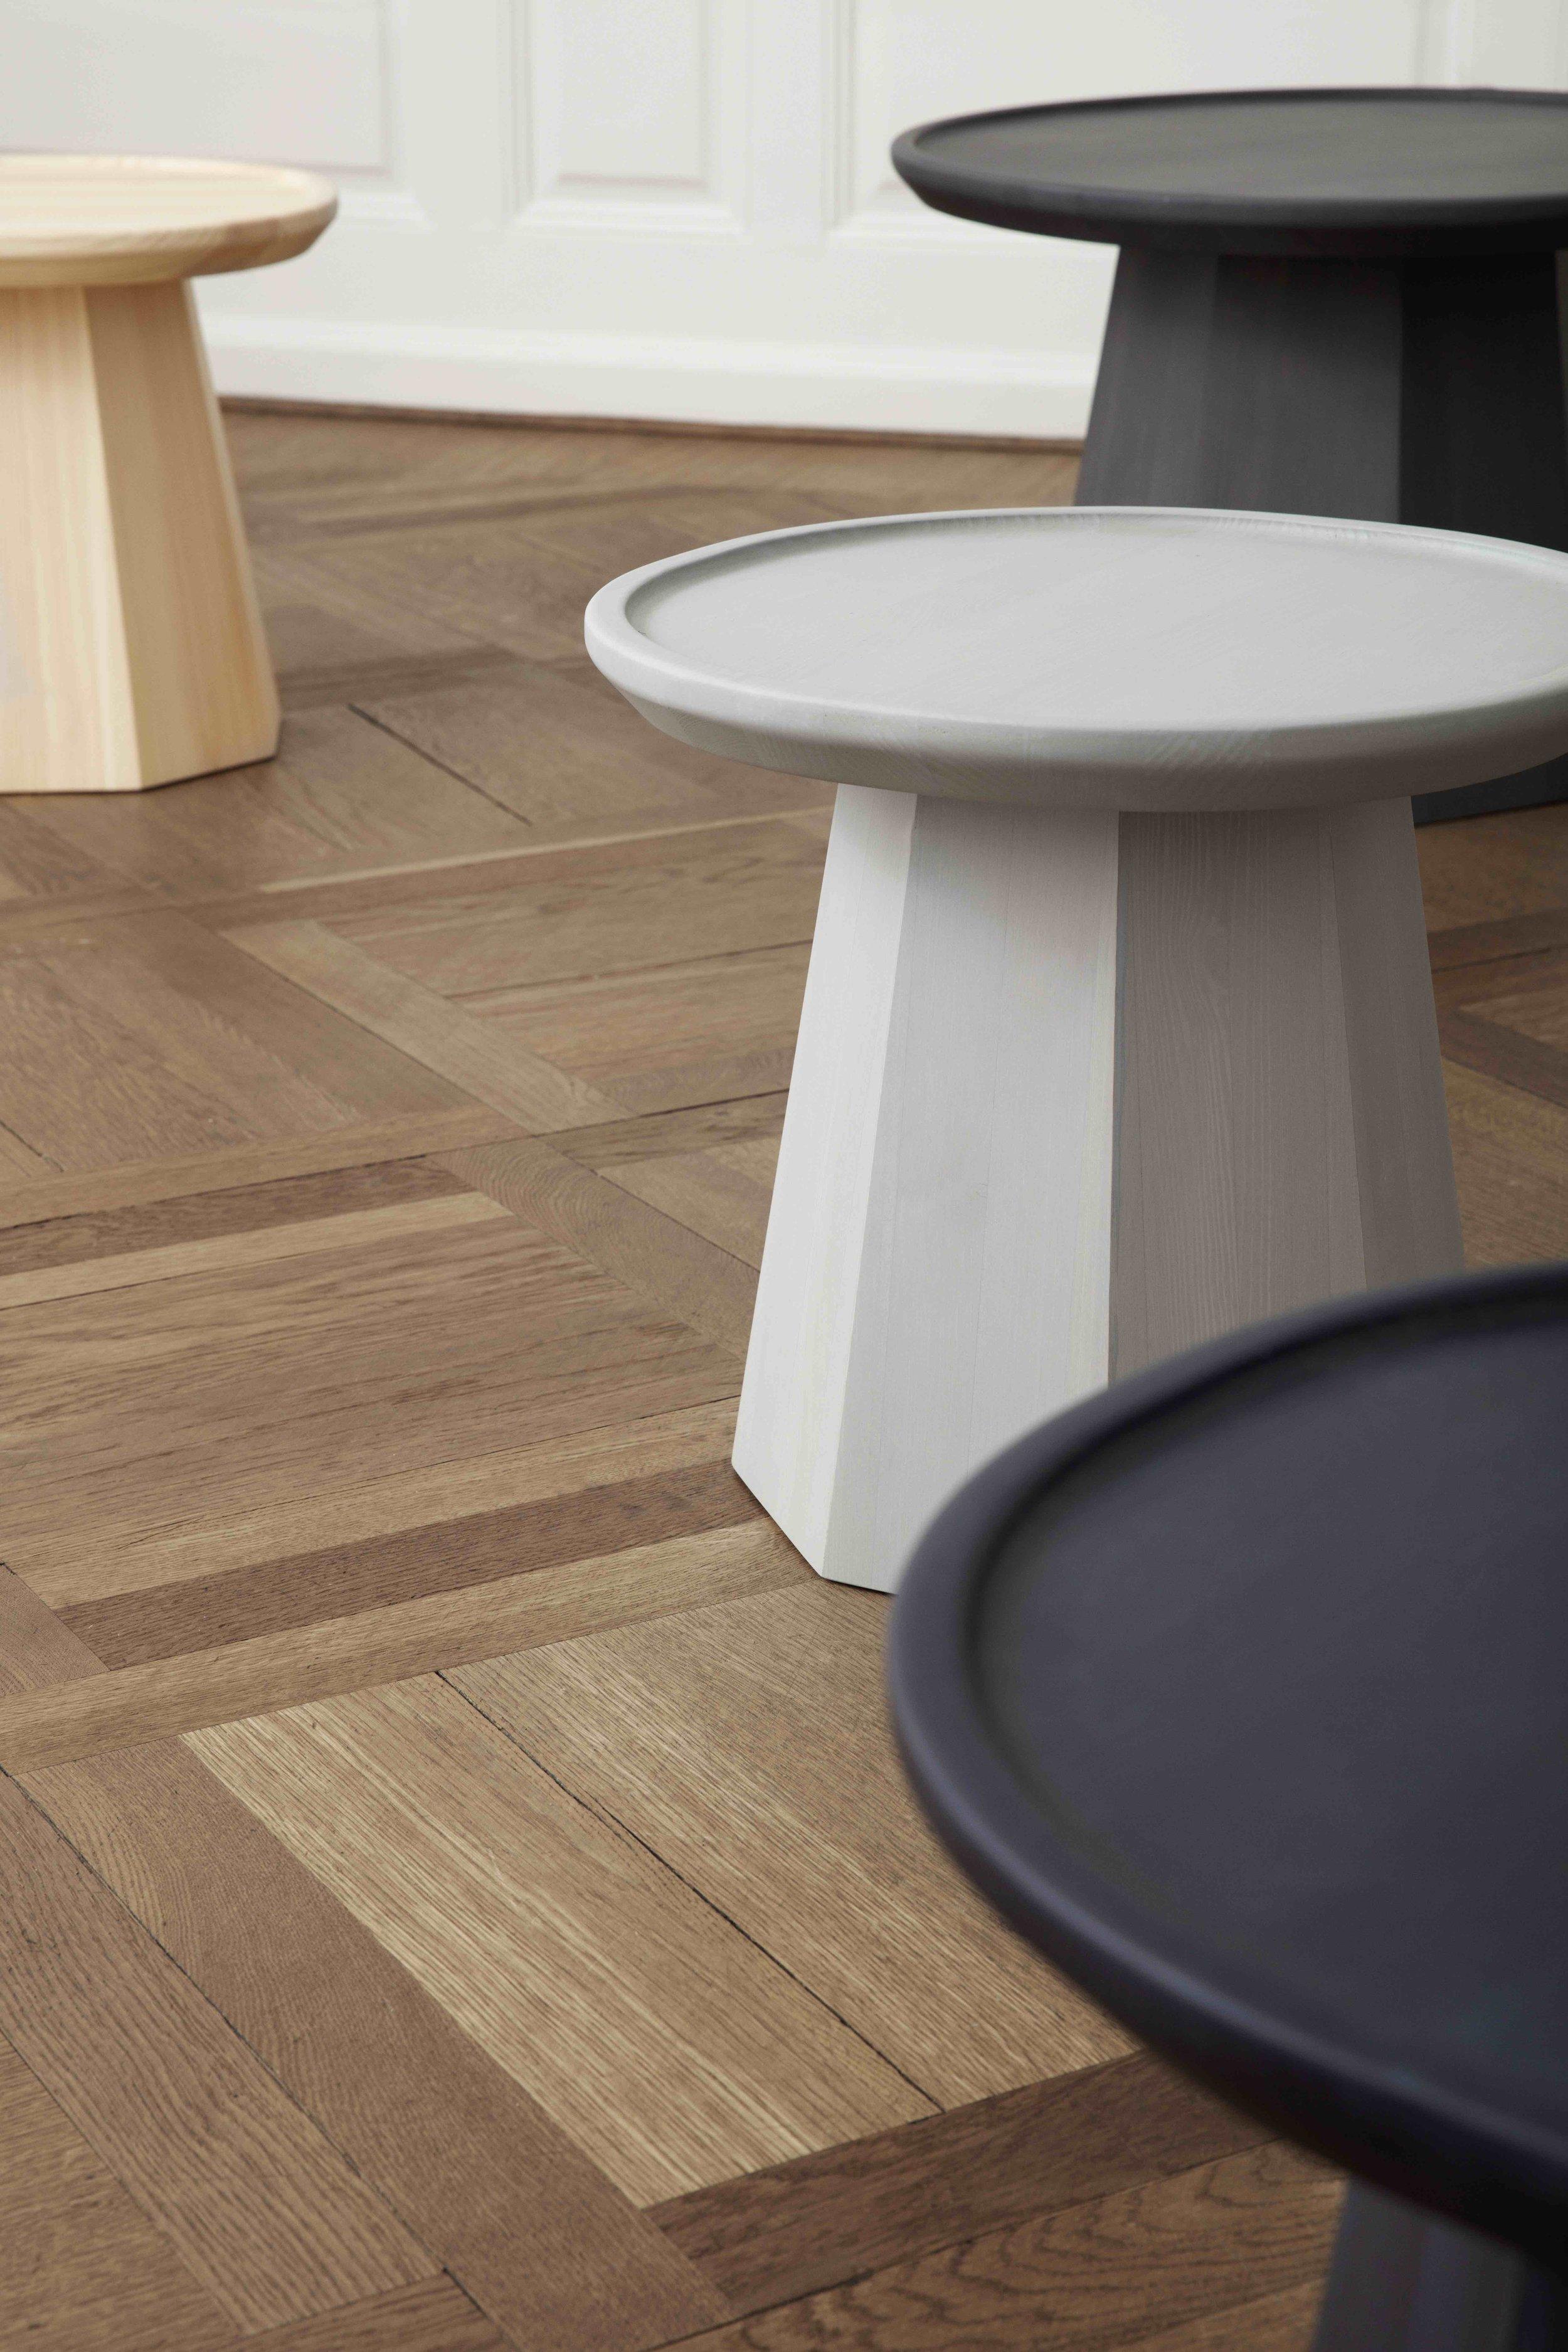 6025_Normann_Copenhagen_Pine_Table_Group_02 copy.jpg